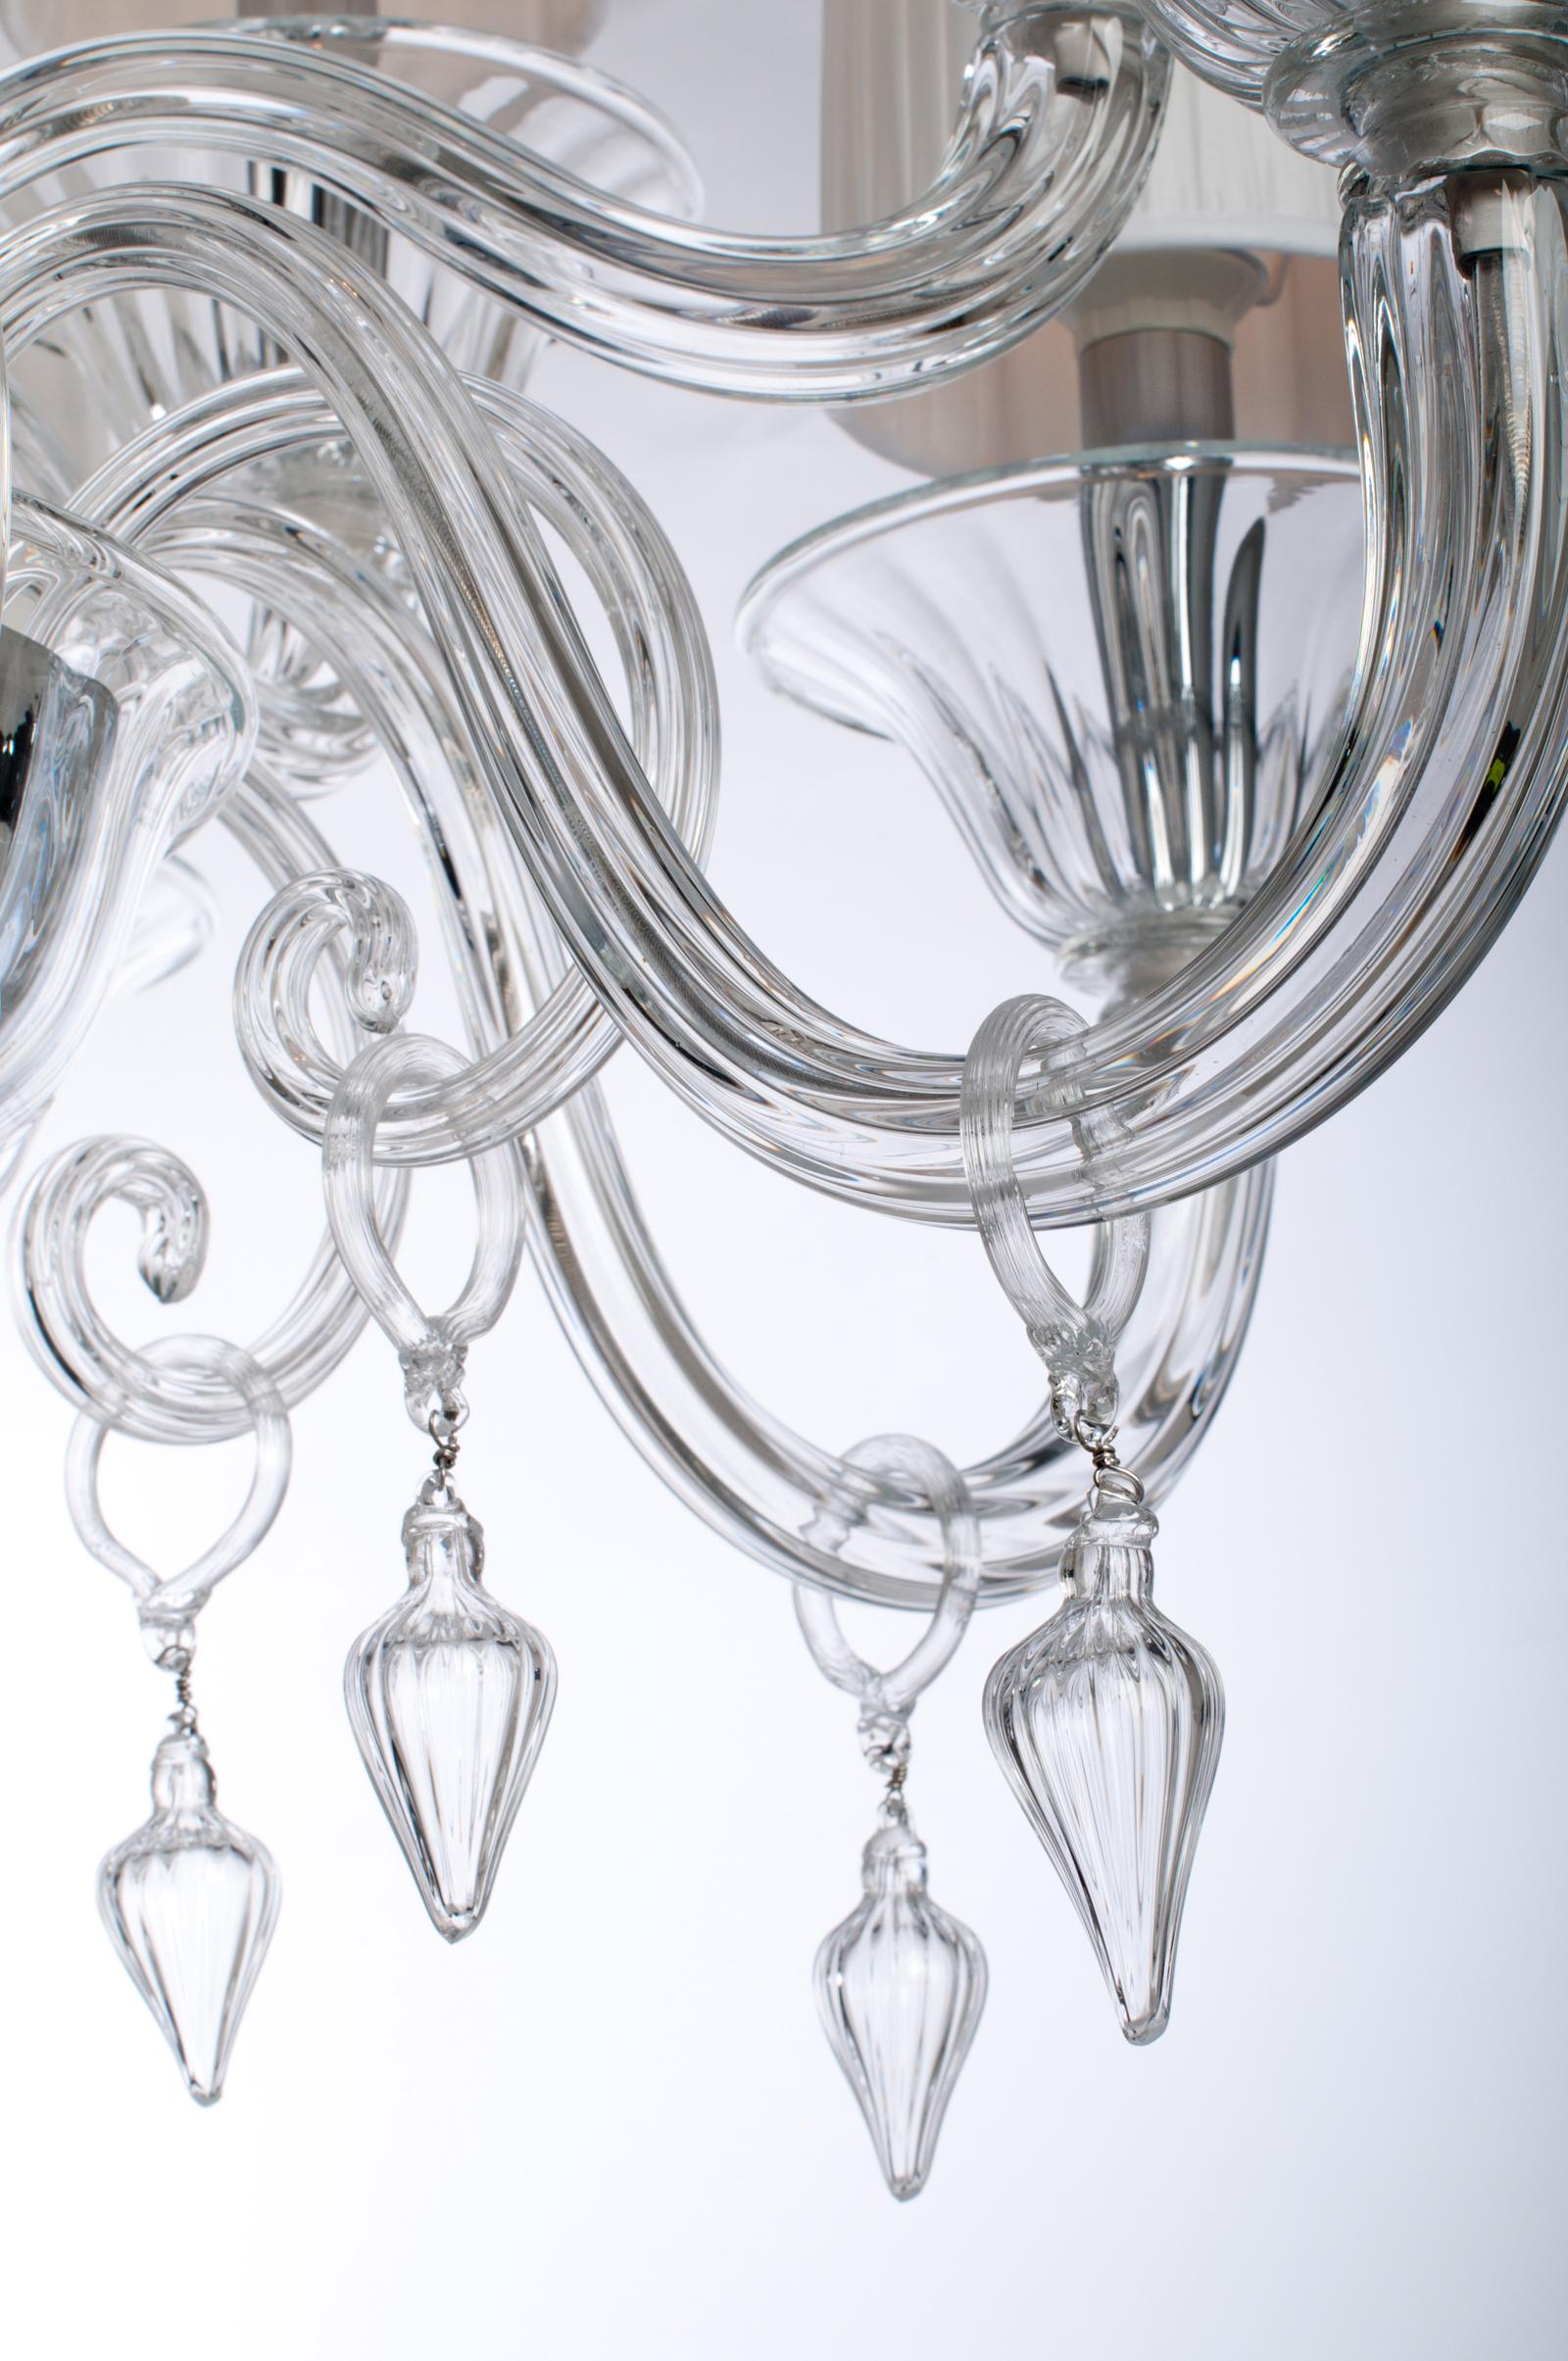 cachemire-lustre-chandelier-veronese-3.jpg